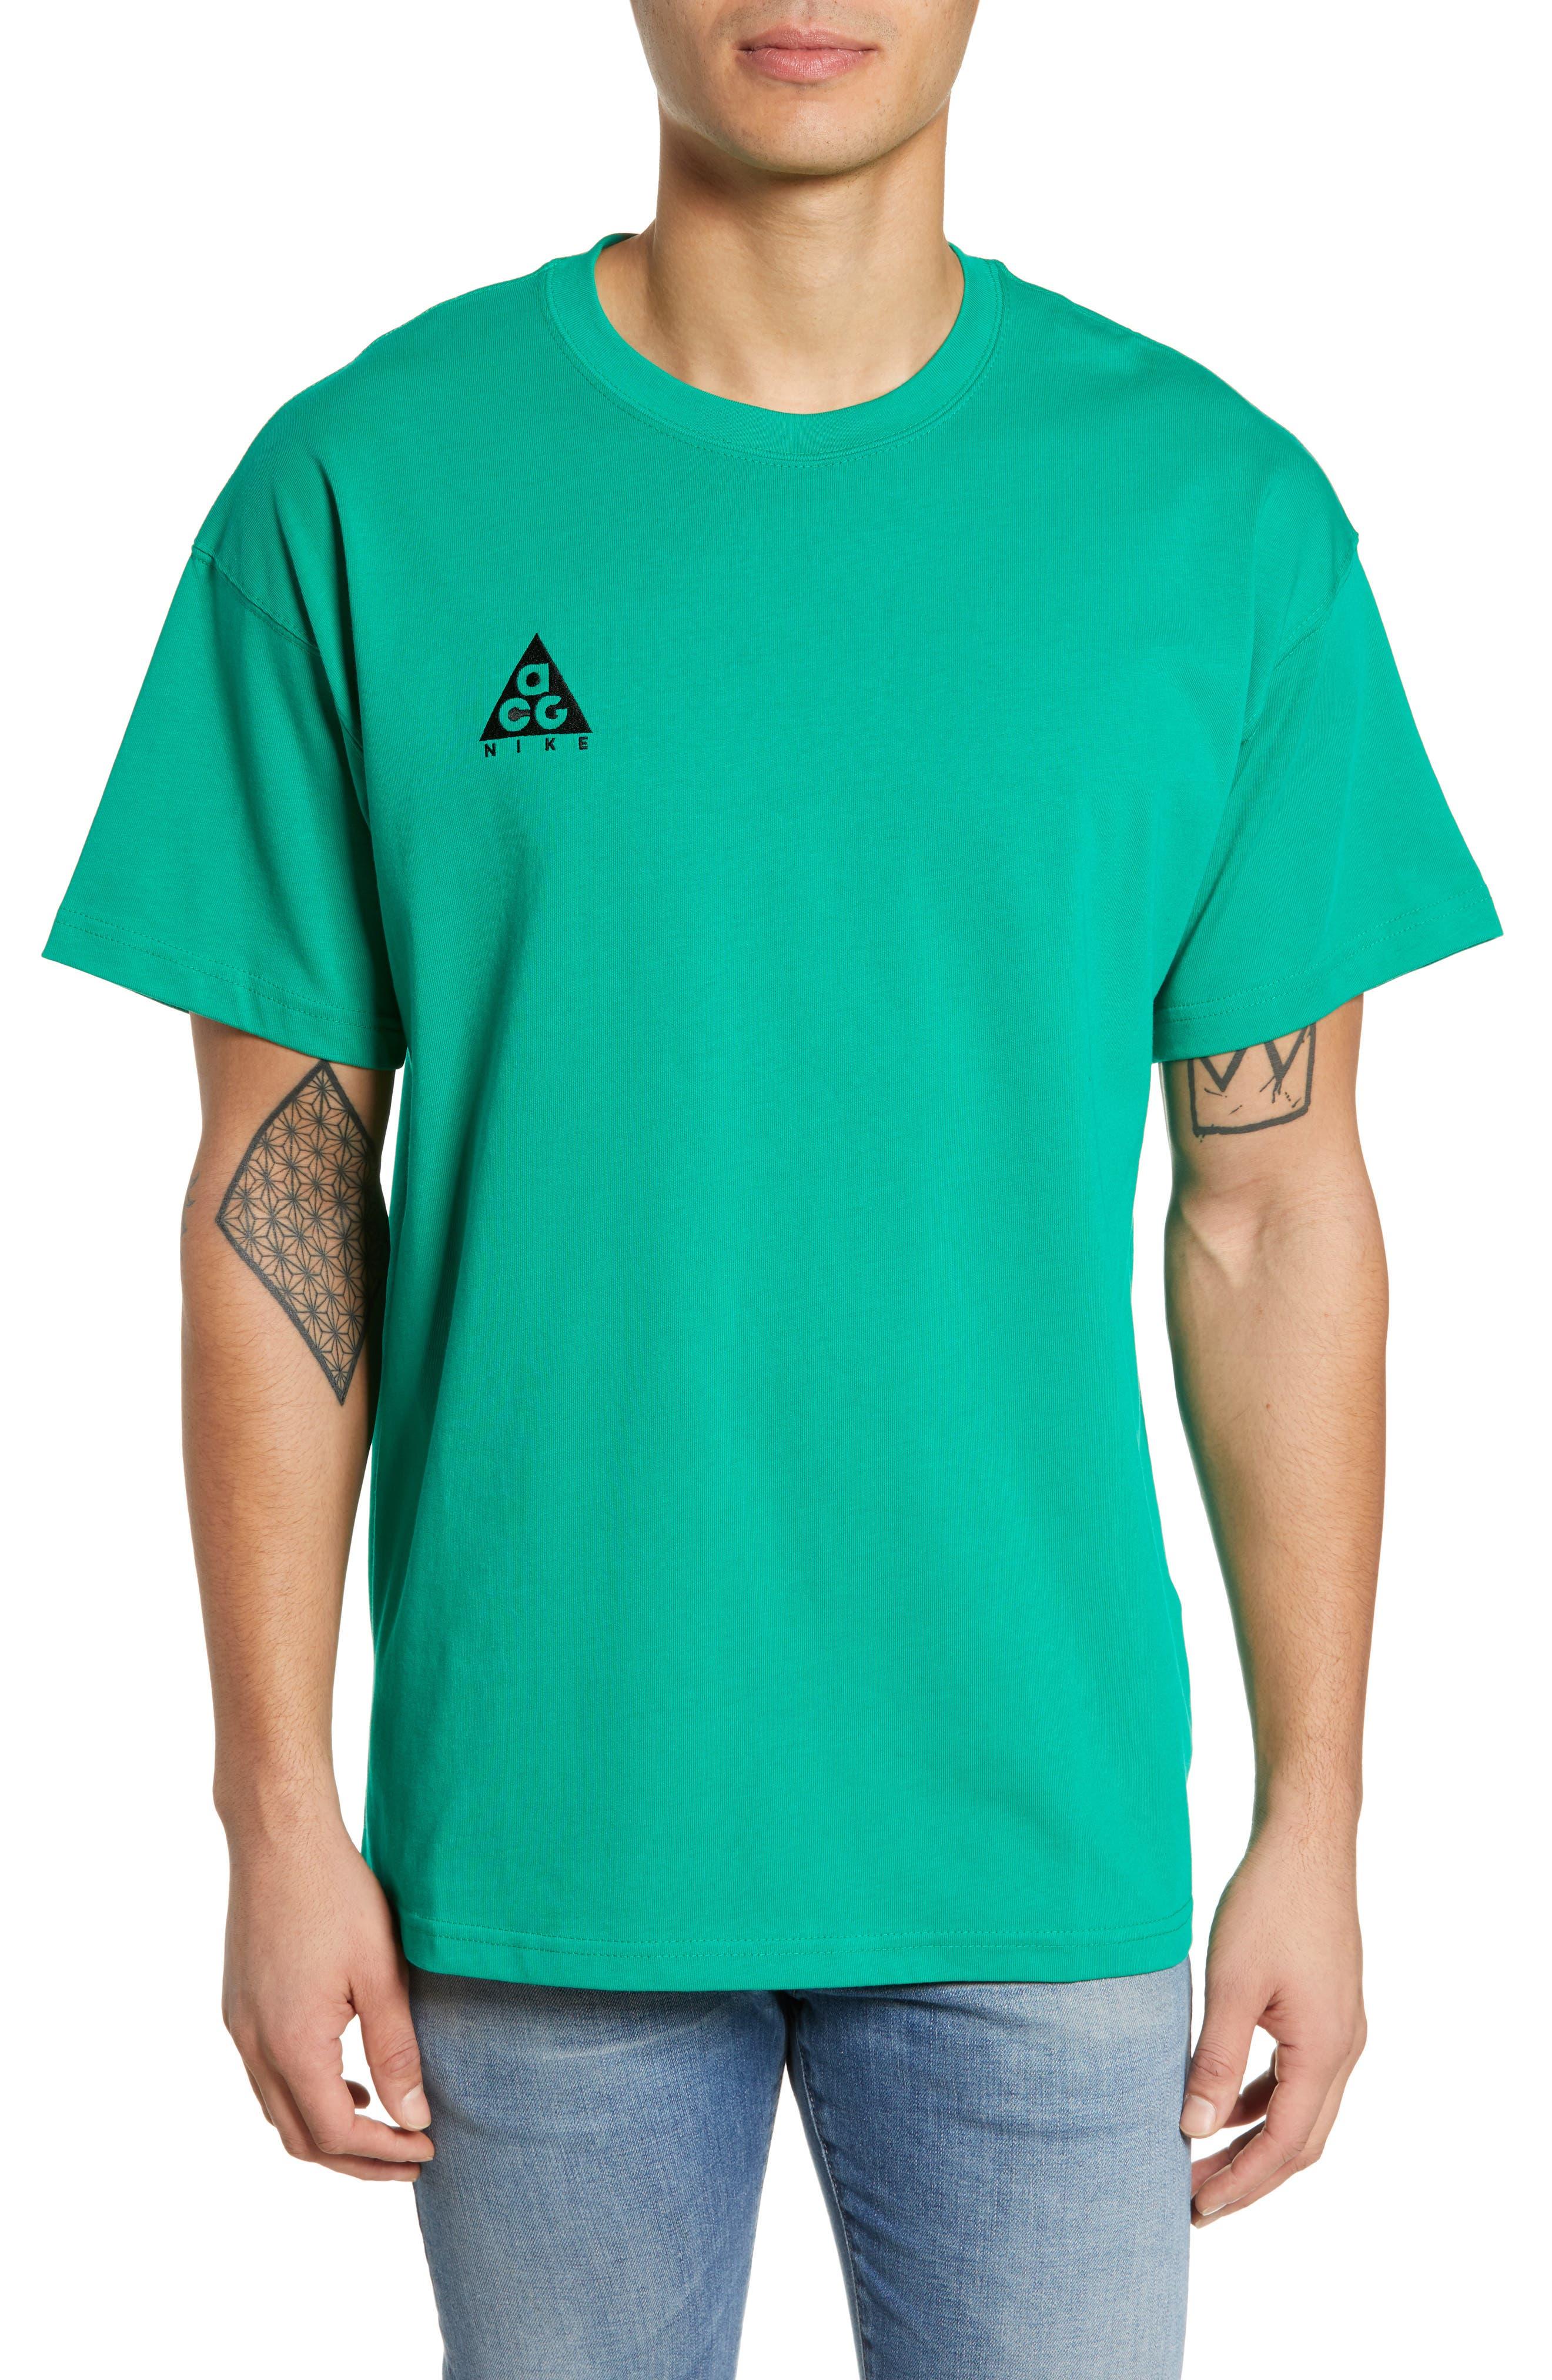 Nike Nrg All Conditions Gear Logo T-Shirt, Green